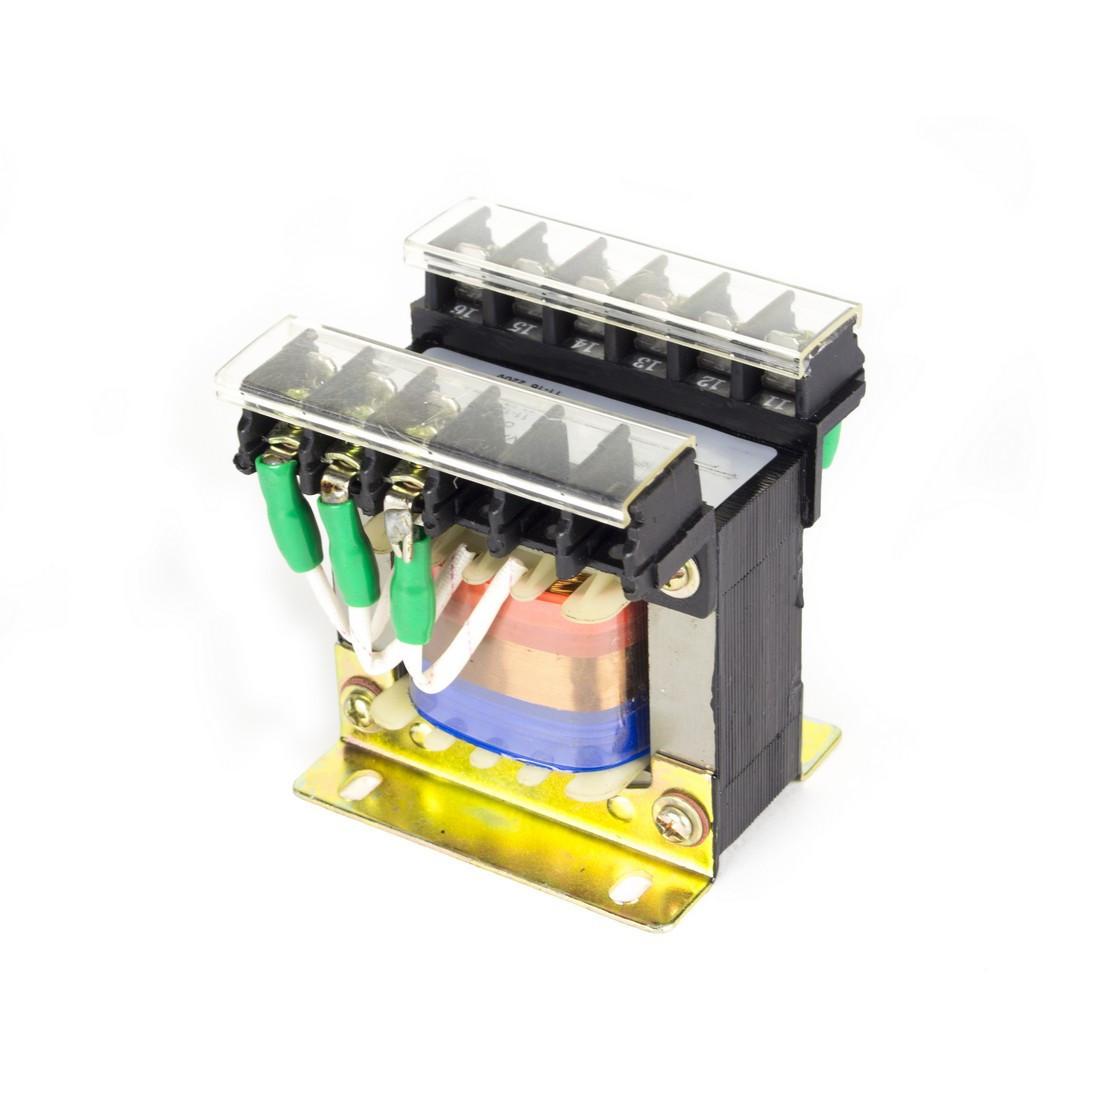 Трансформатор понижающий iPower JBK3-630 VA - фото 2